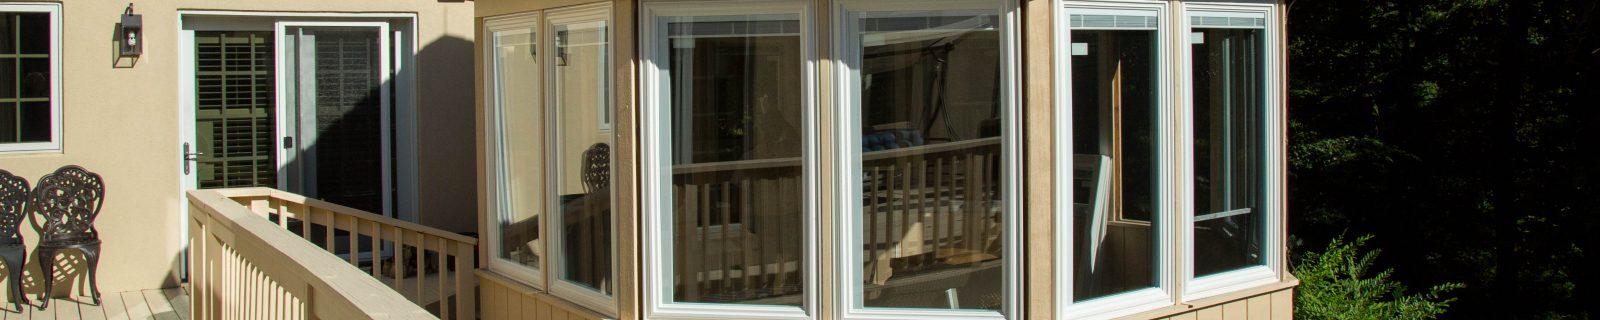 replacement windows in patio enclosure